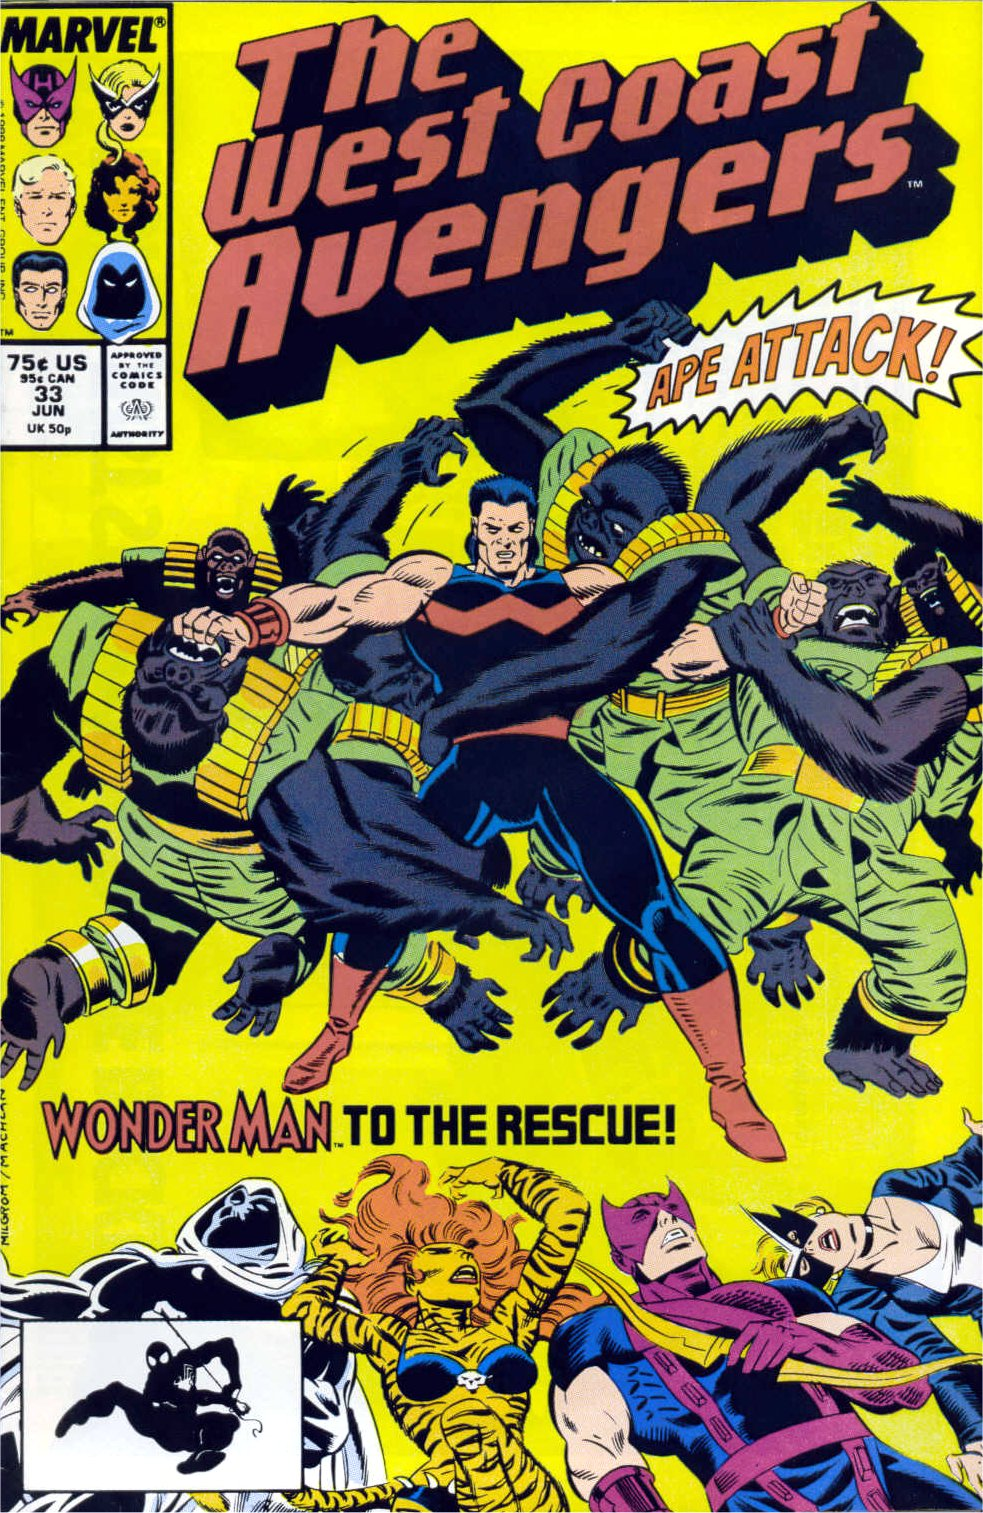 West Coast Avengers (1985) 33 Page 1